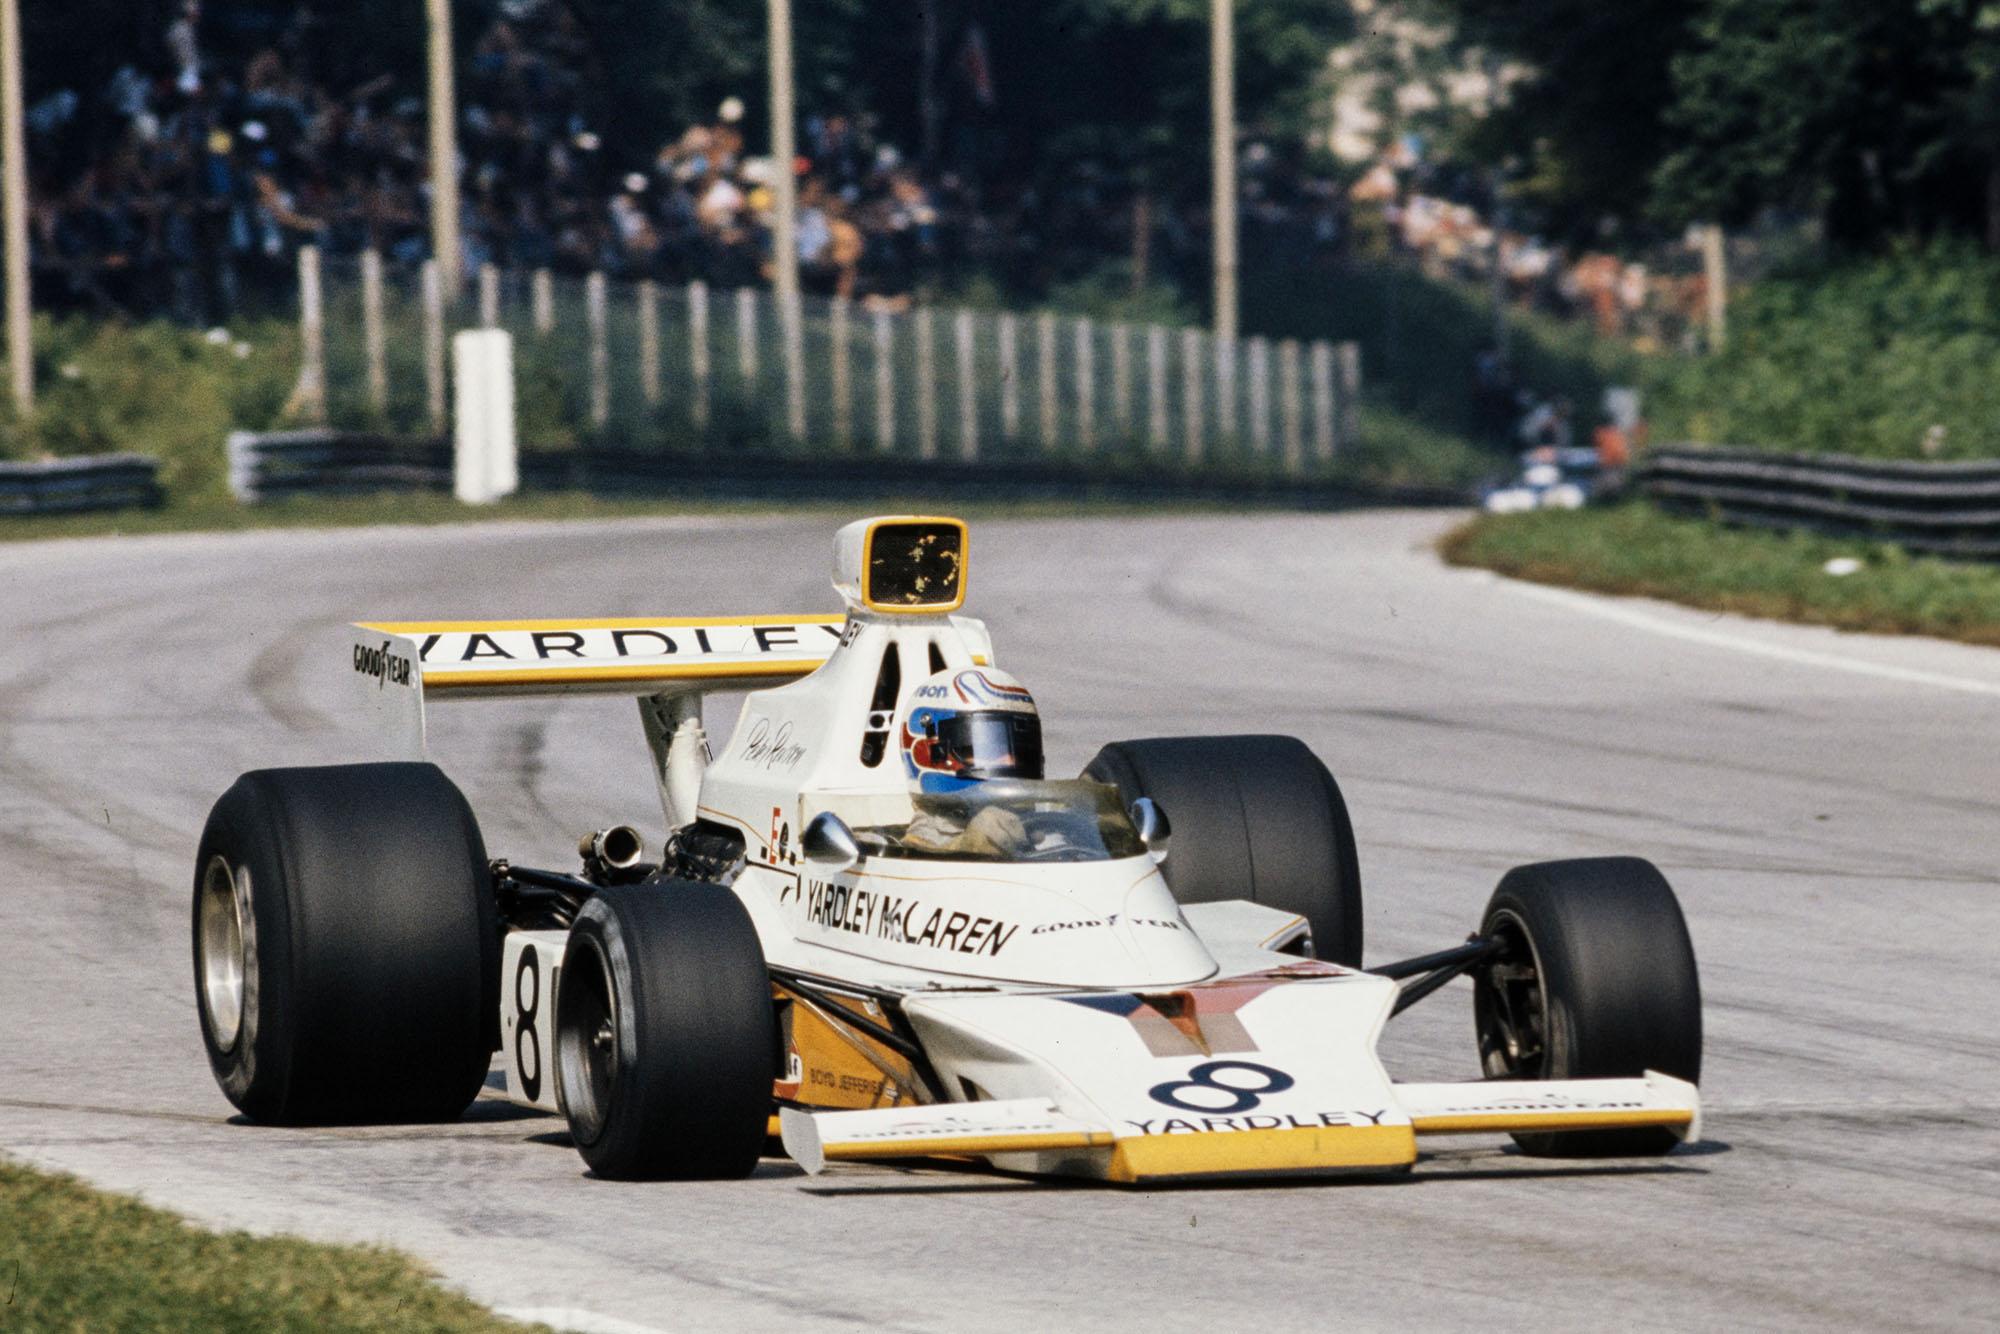 Peter Revson pushing his McLaren at the 1973 Italian Grand Prix, Monza.